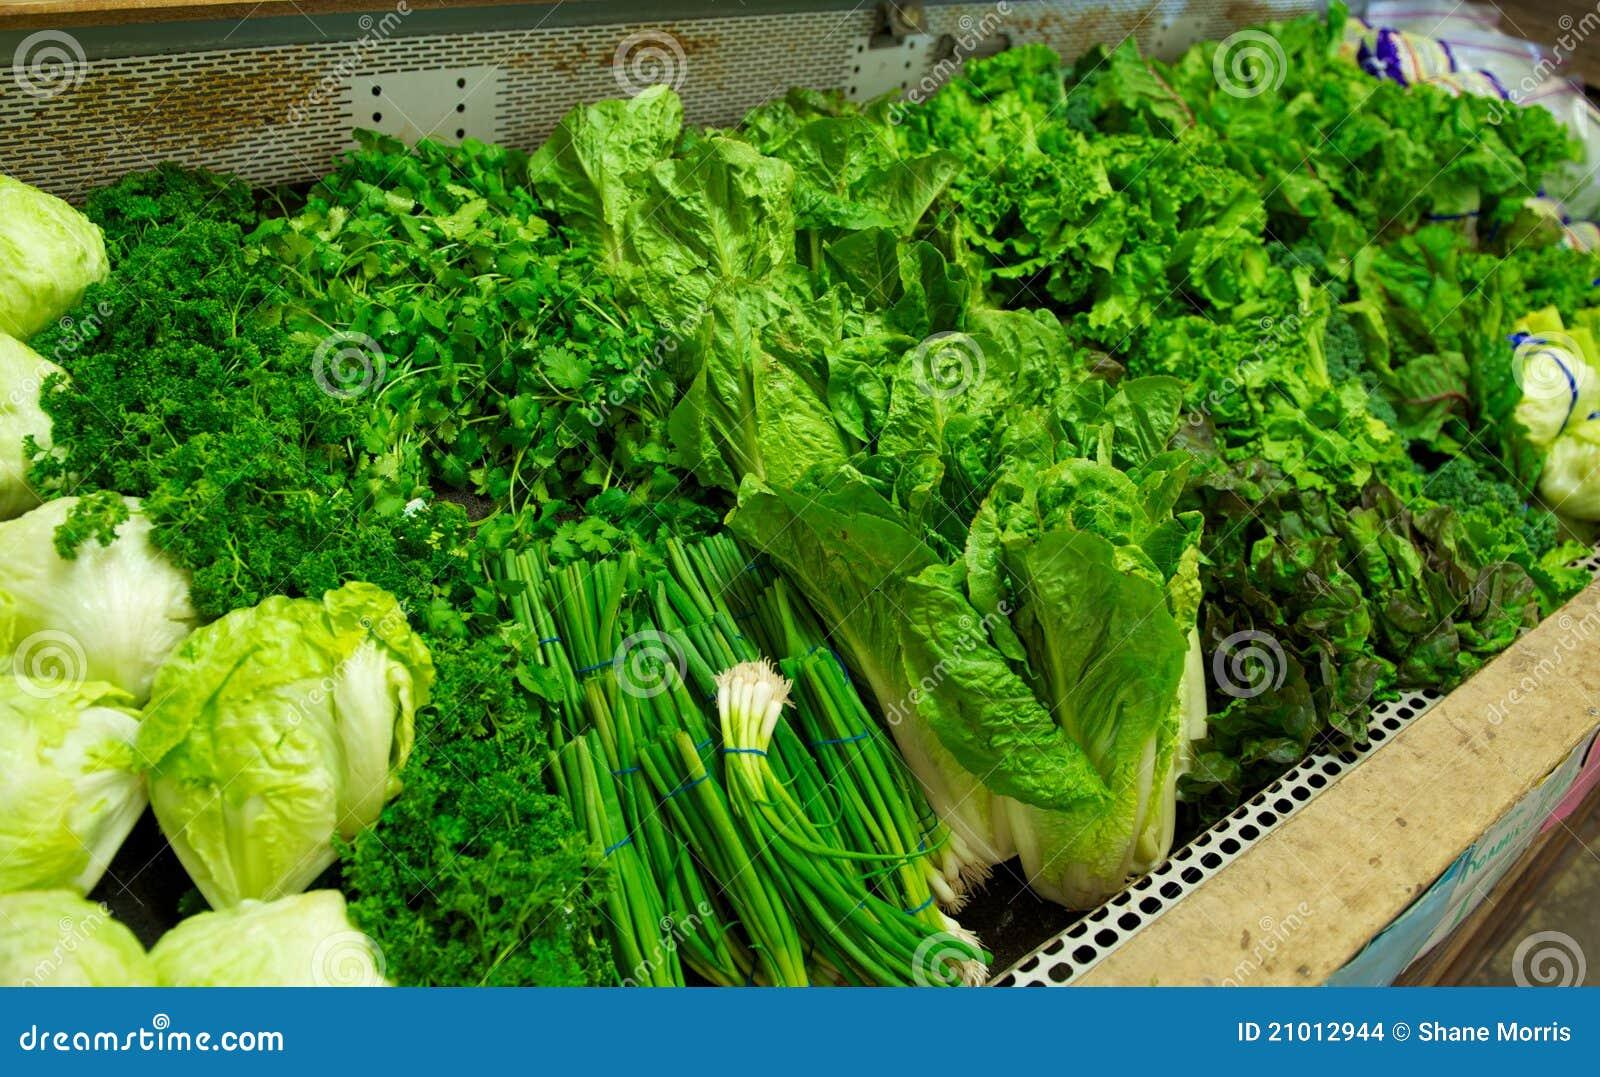 Bright Green Produce in Grocery Store Bin